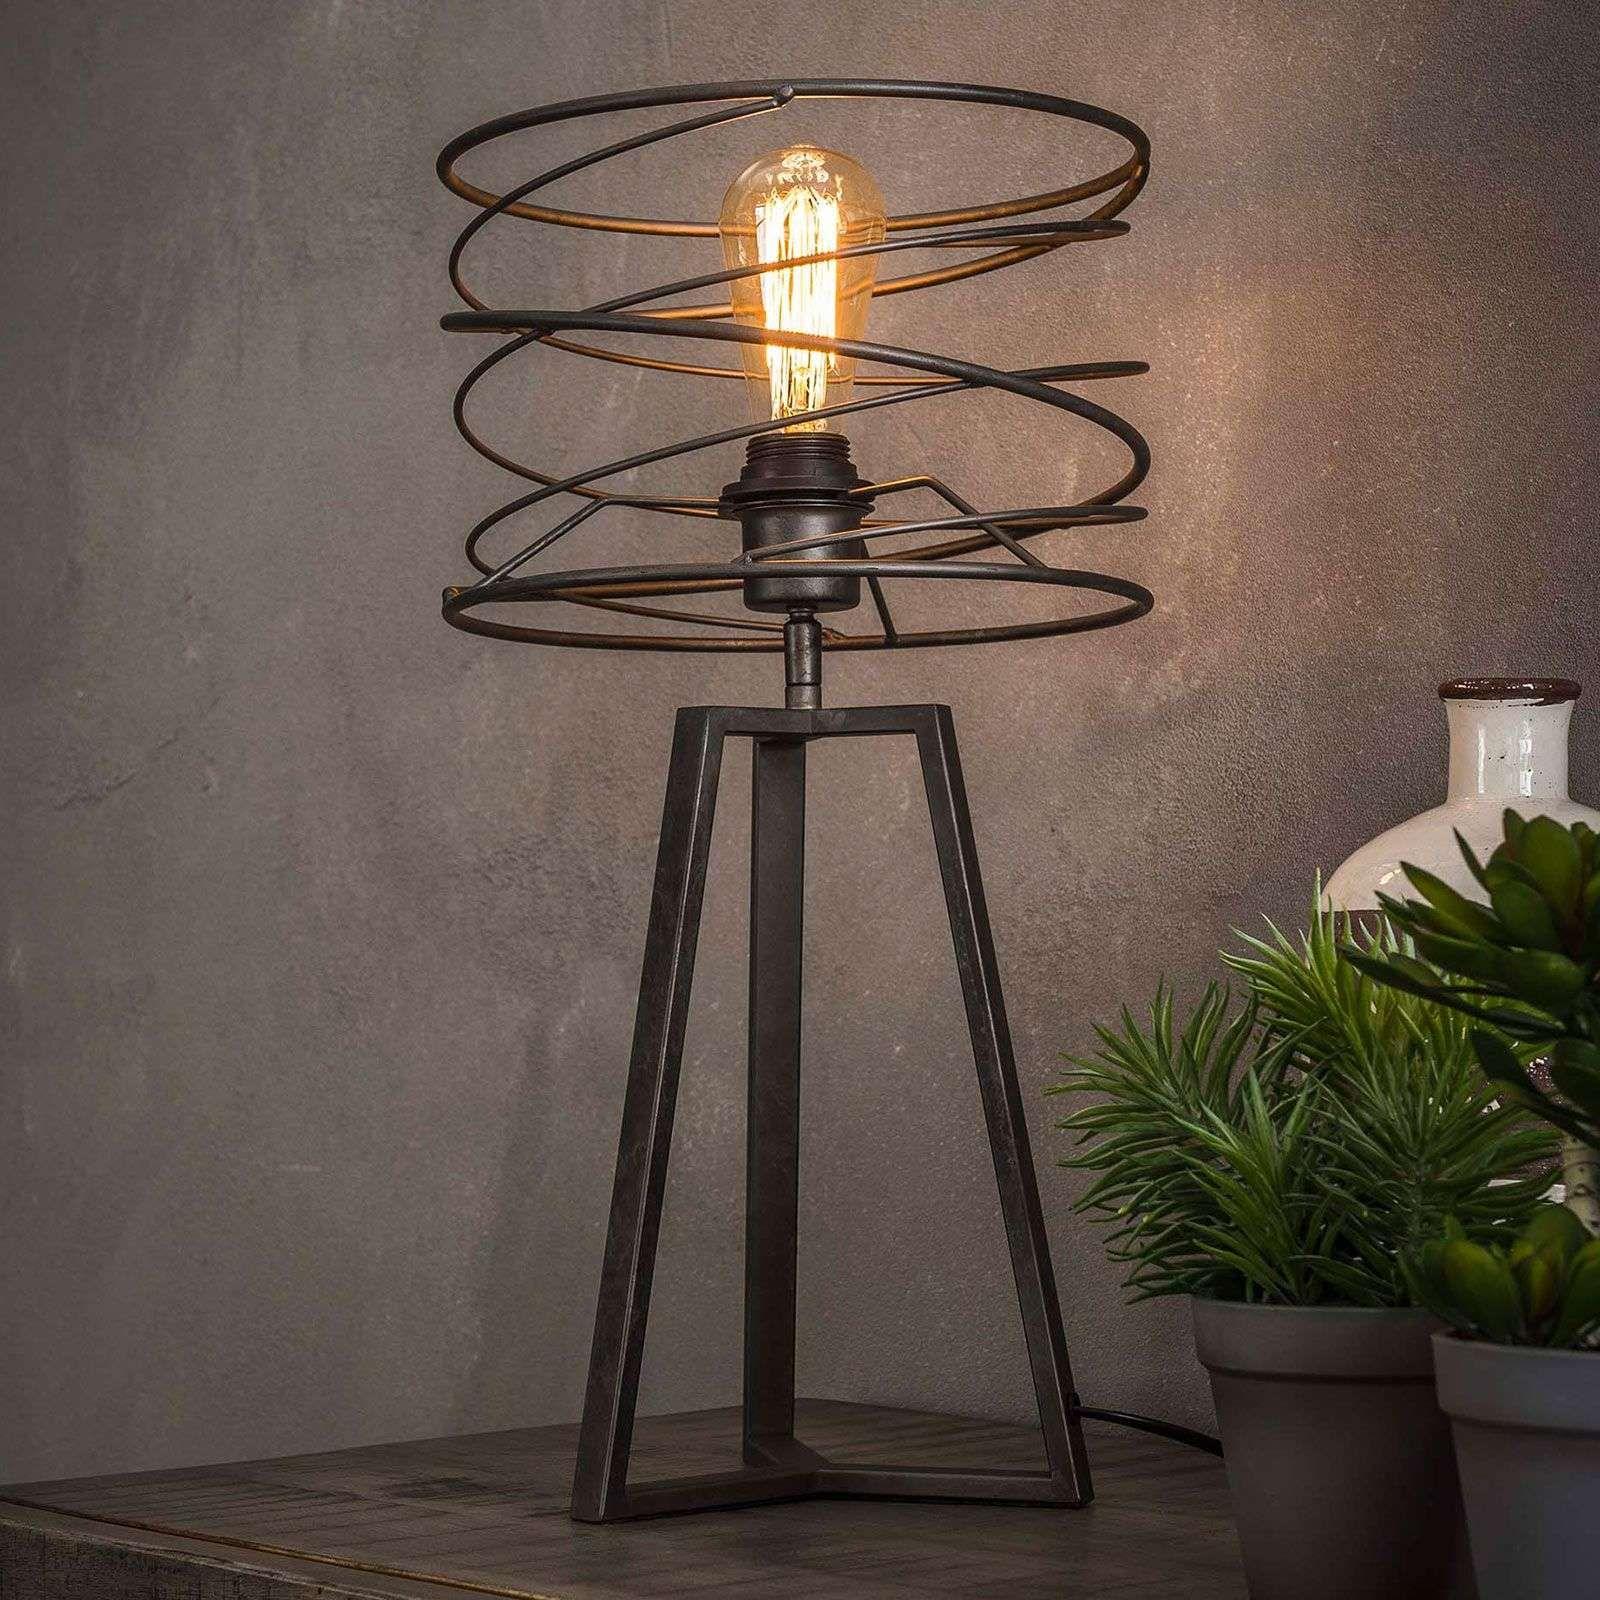 Lampe A Poser Swirlaronda A 1 Lampe Lampe Industrielle Lampe A Poser Abat Jour